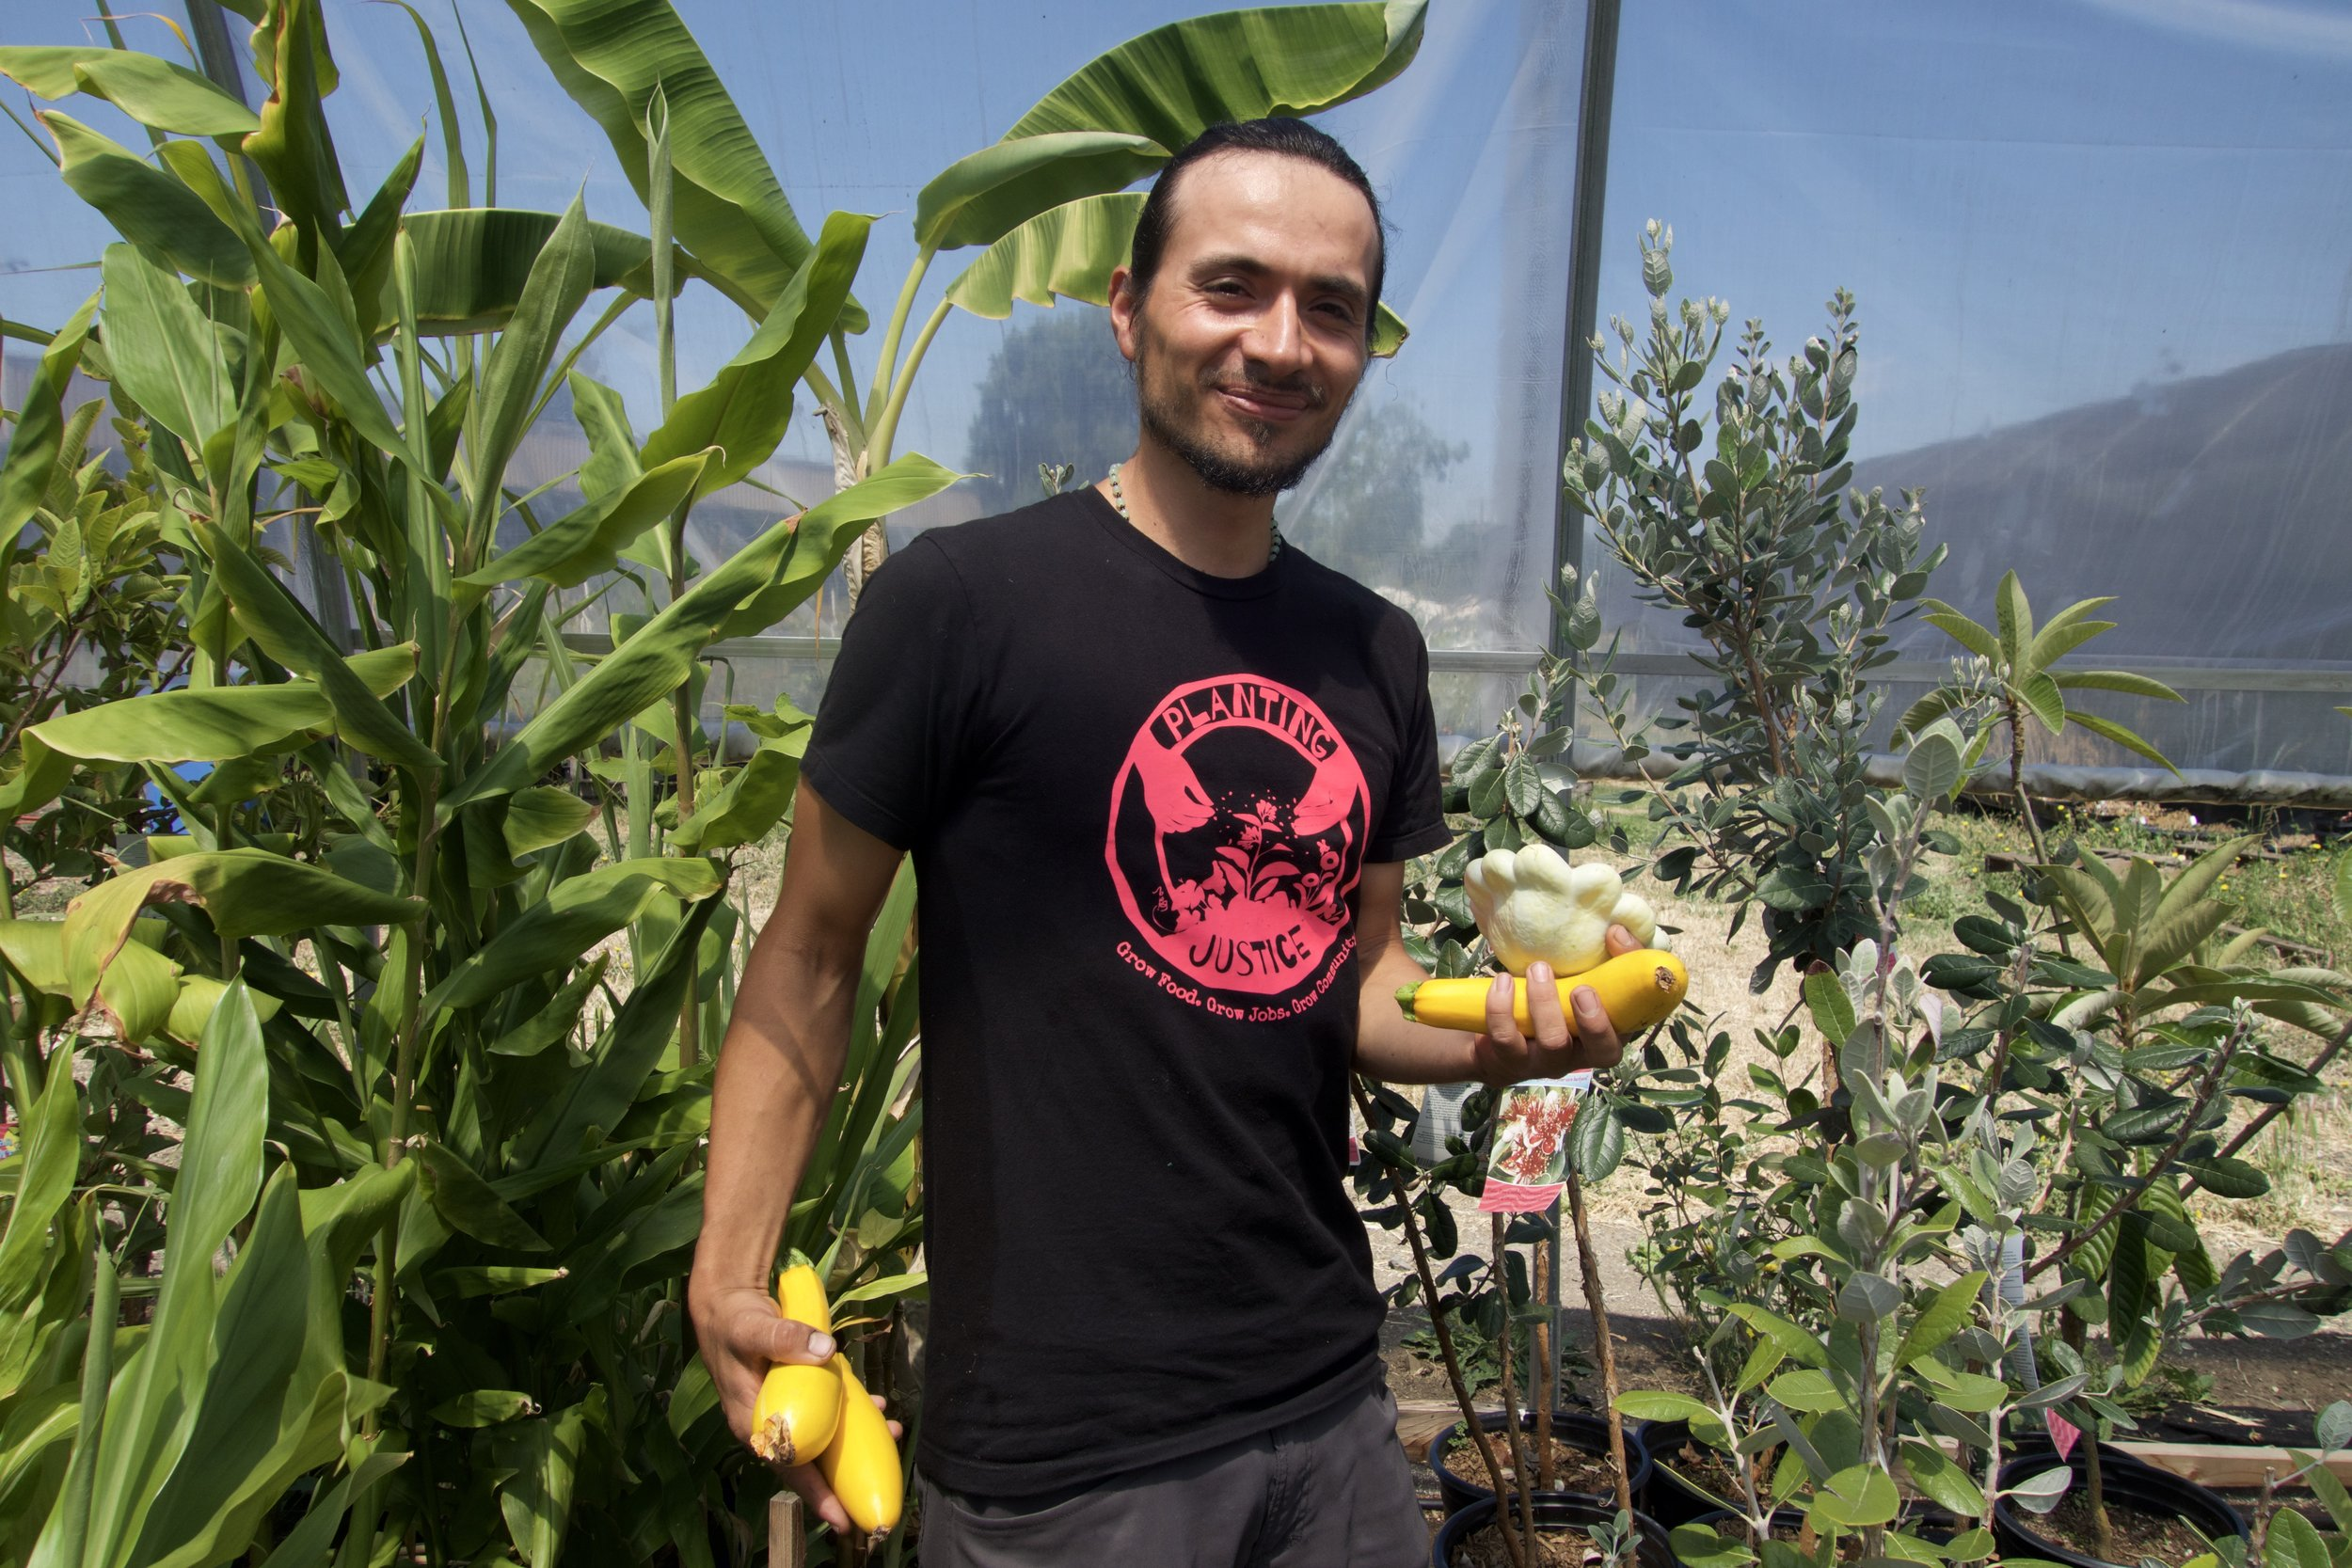 Planting Justice Nursery Team, Jose